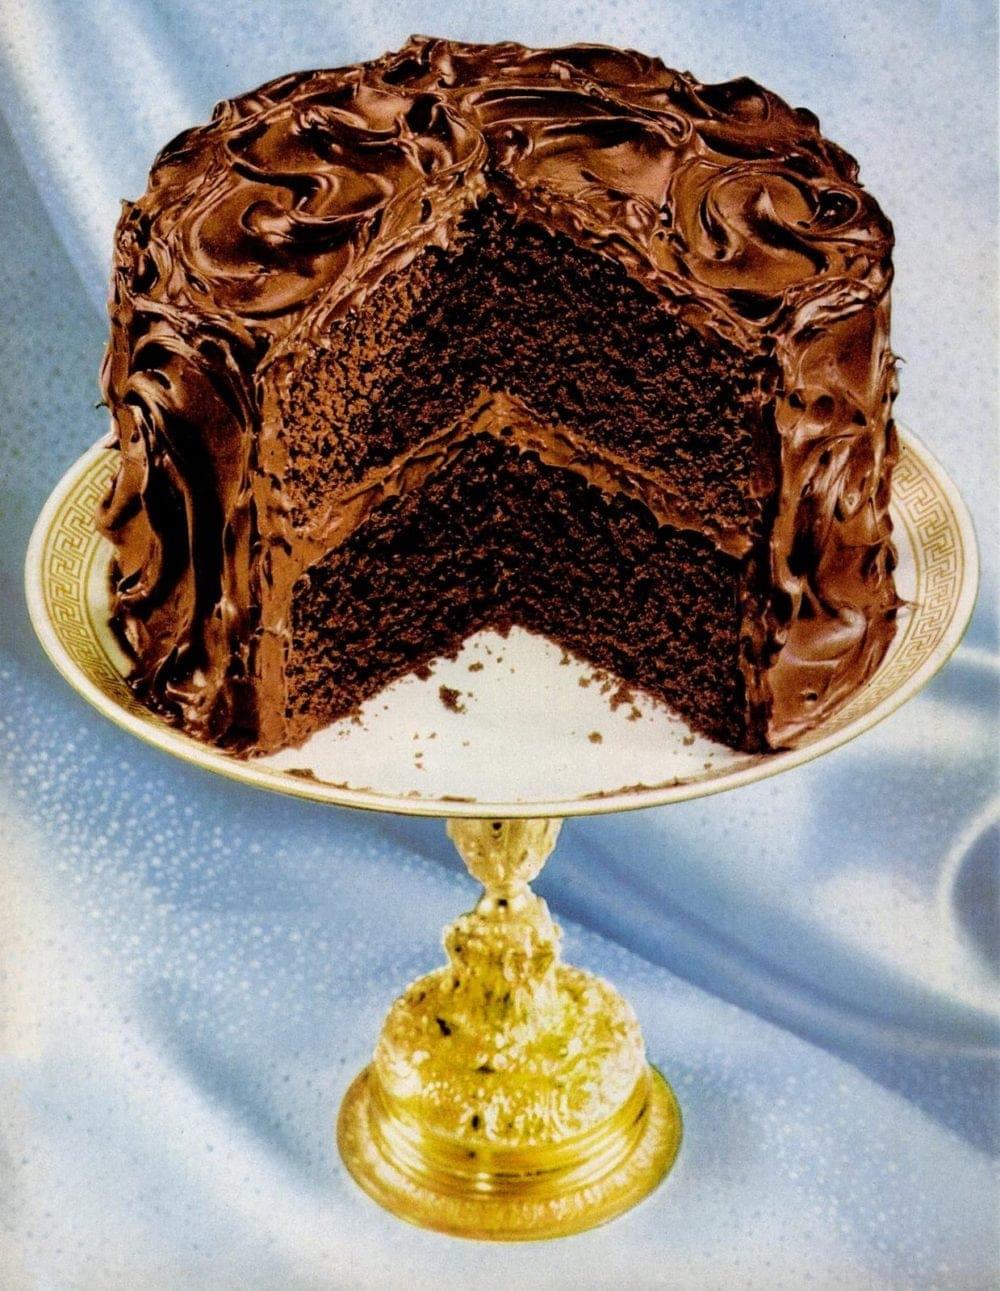 1956 Chocolate cake